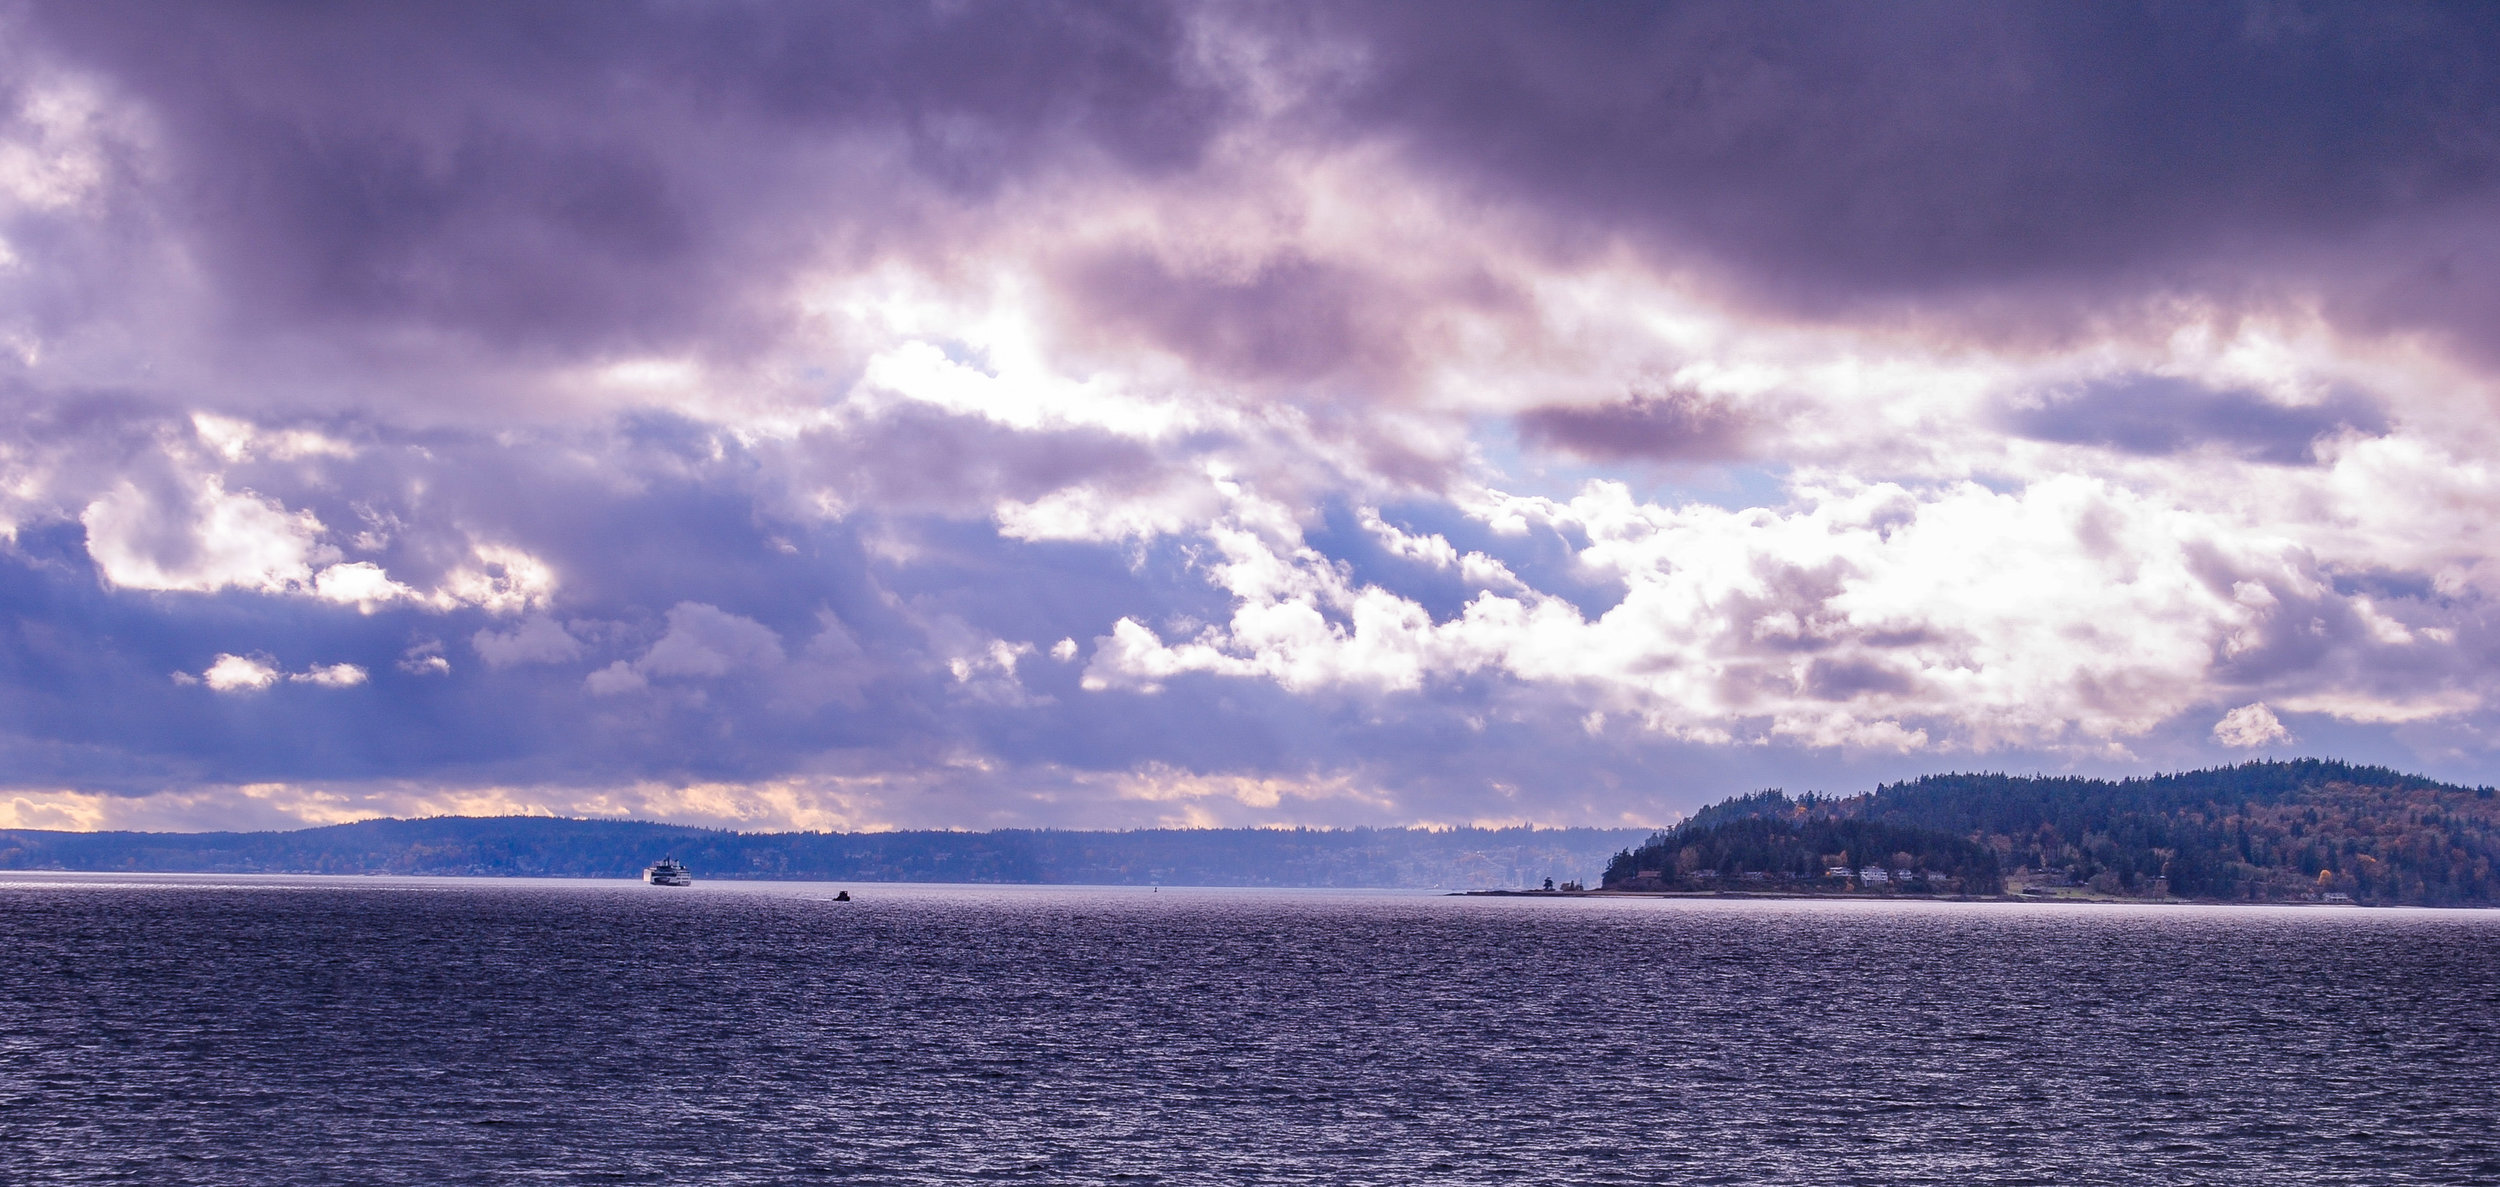 Bainbridge Island from Ferry